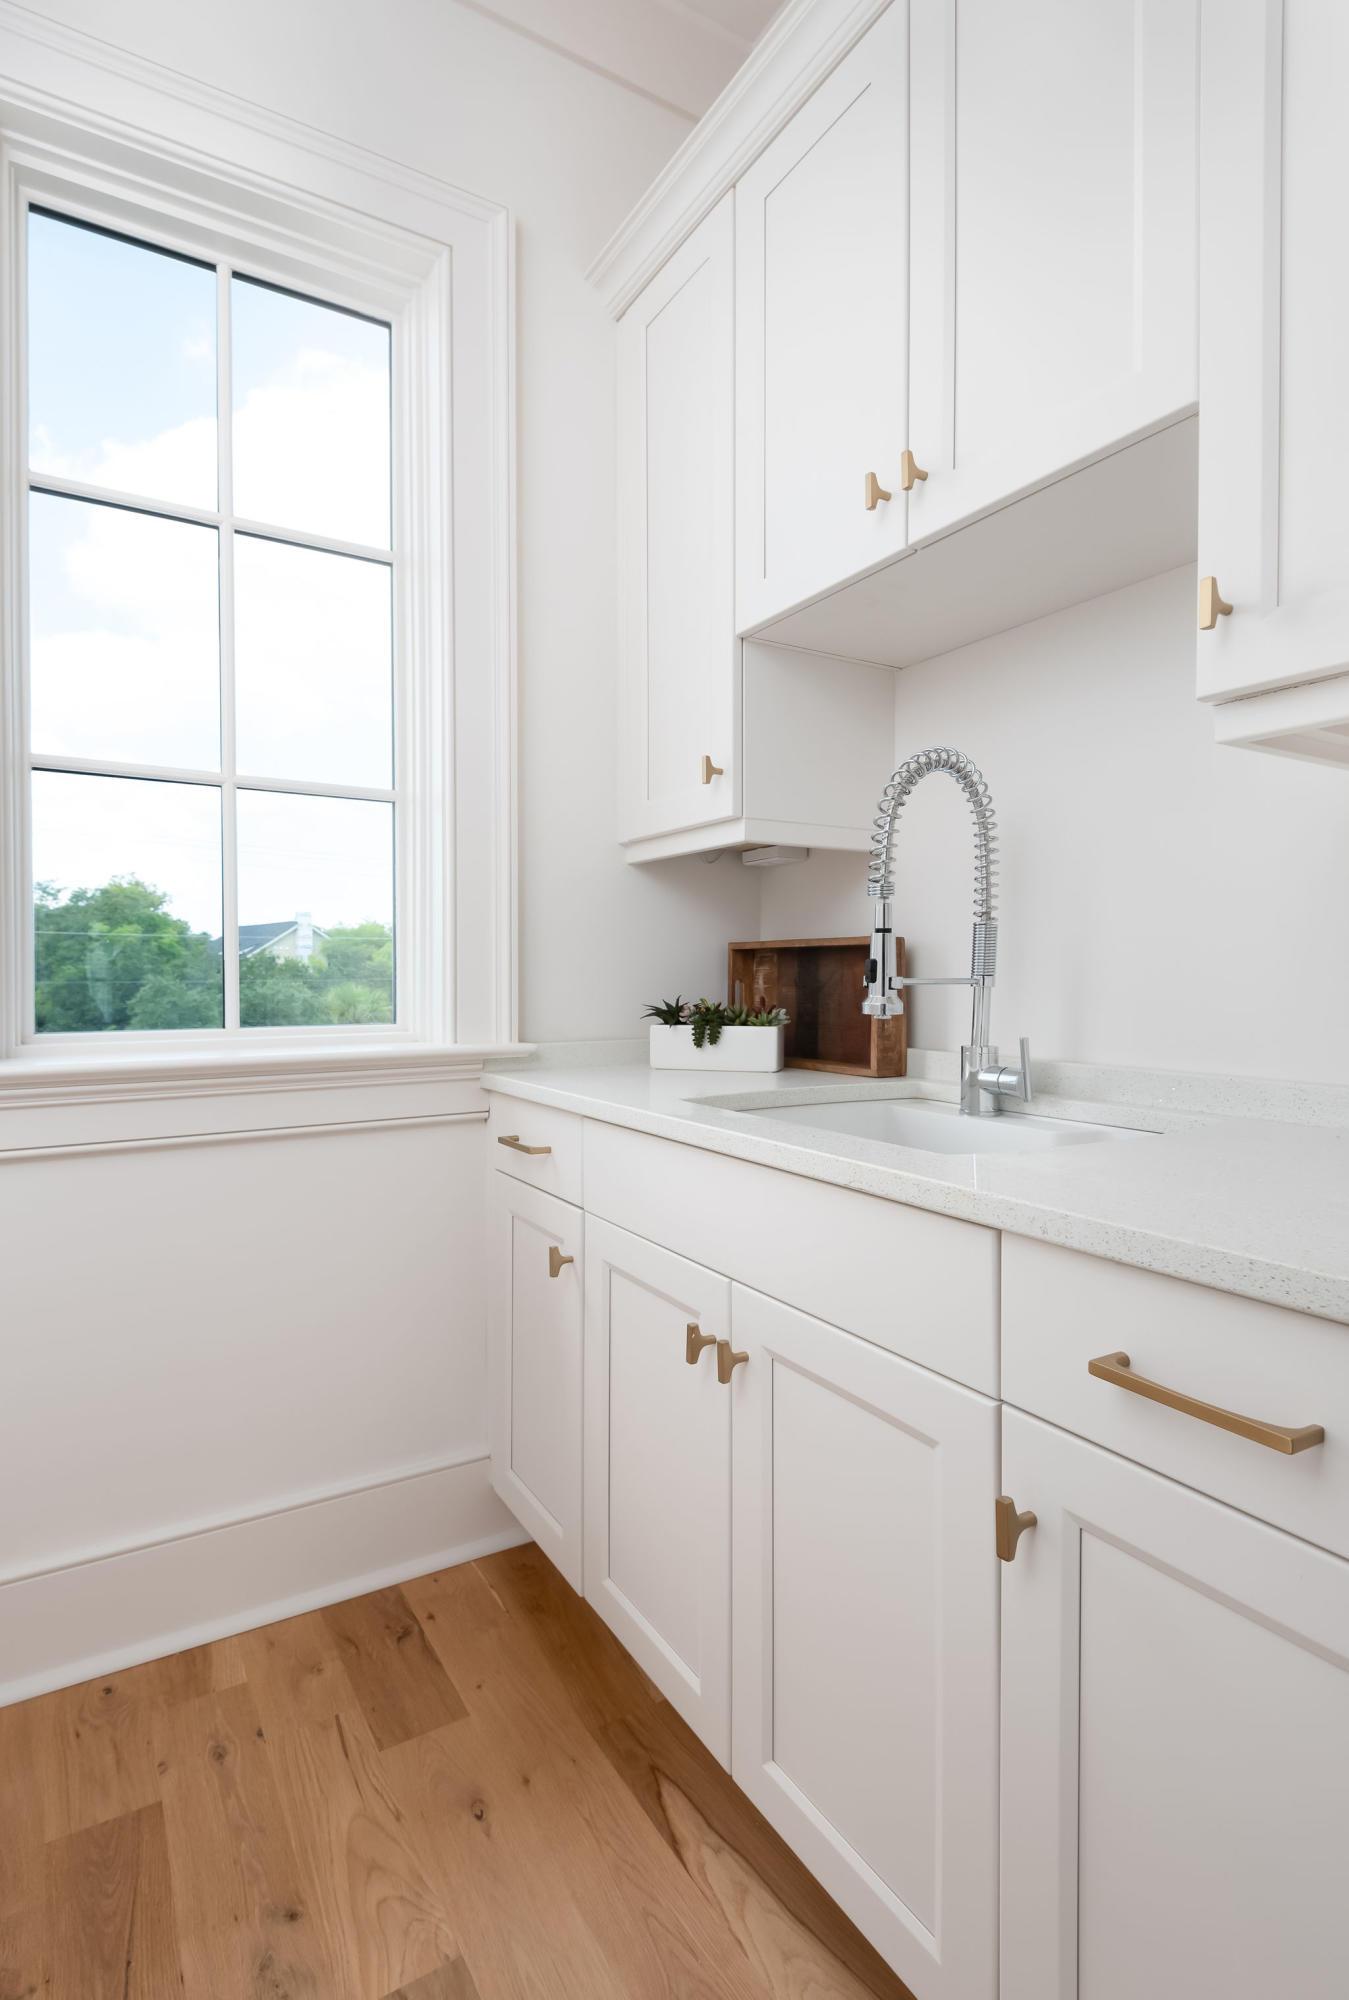 Harleston Village Homes For Sale - 55 Barre, Charleston, SC - 25